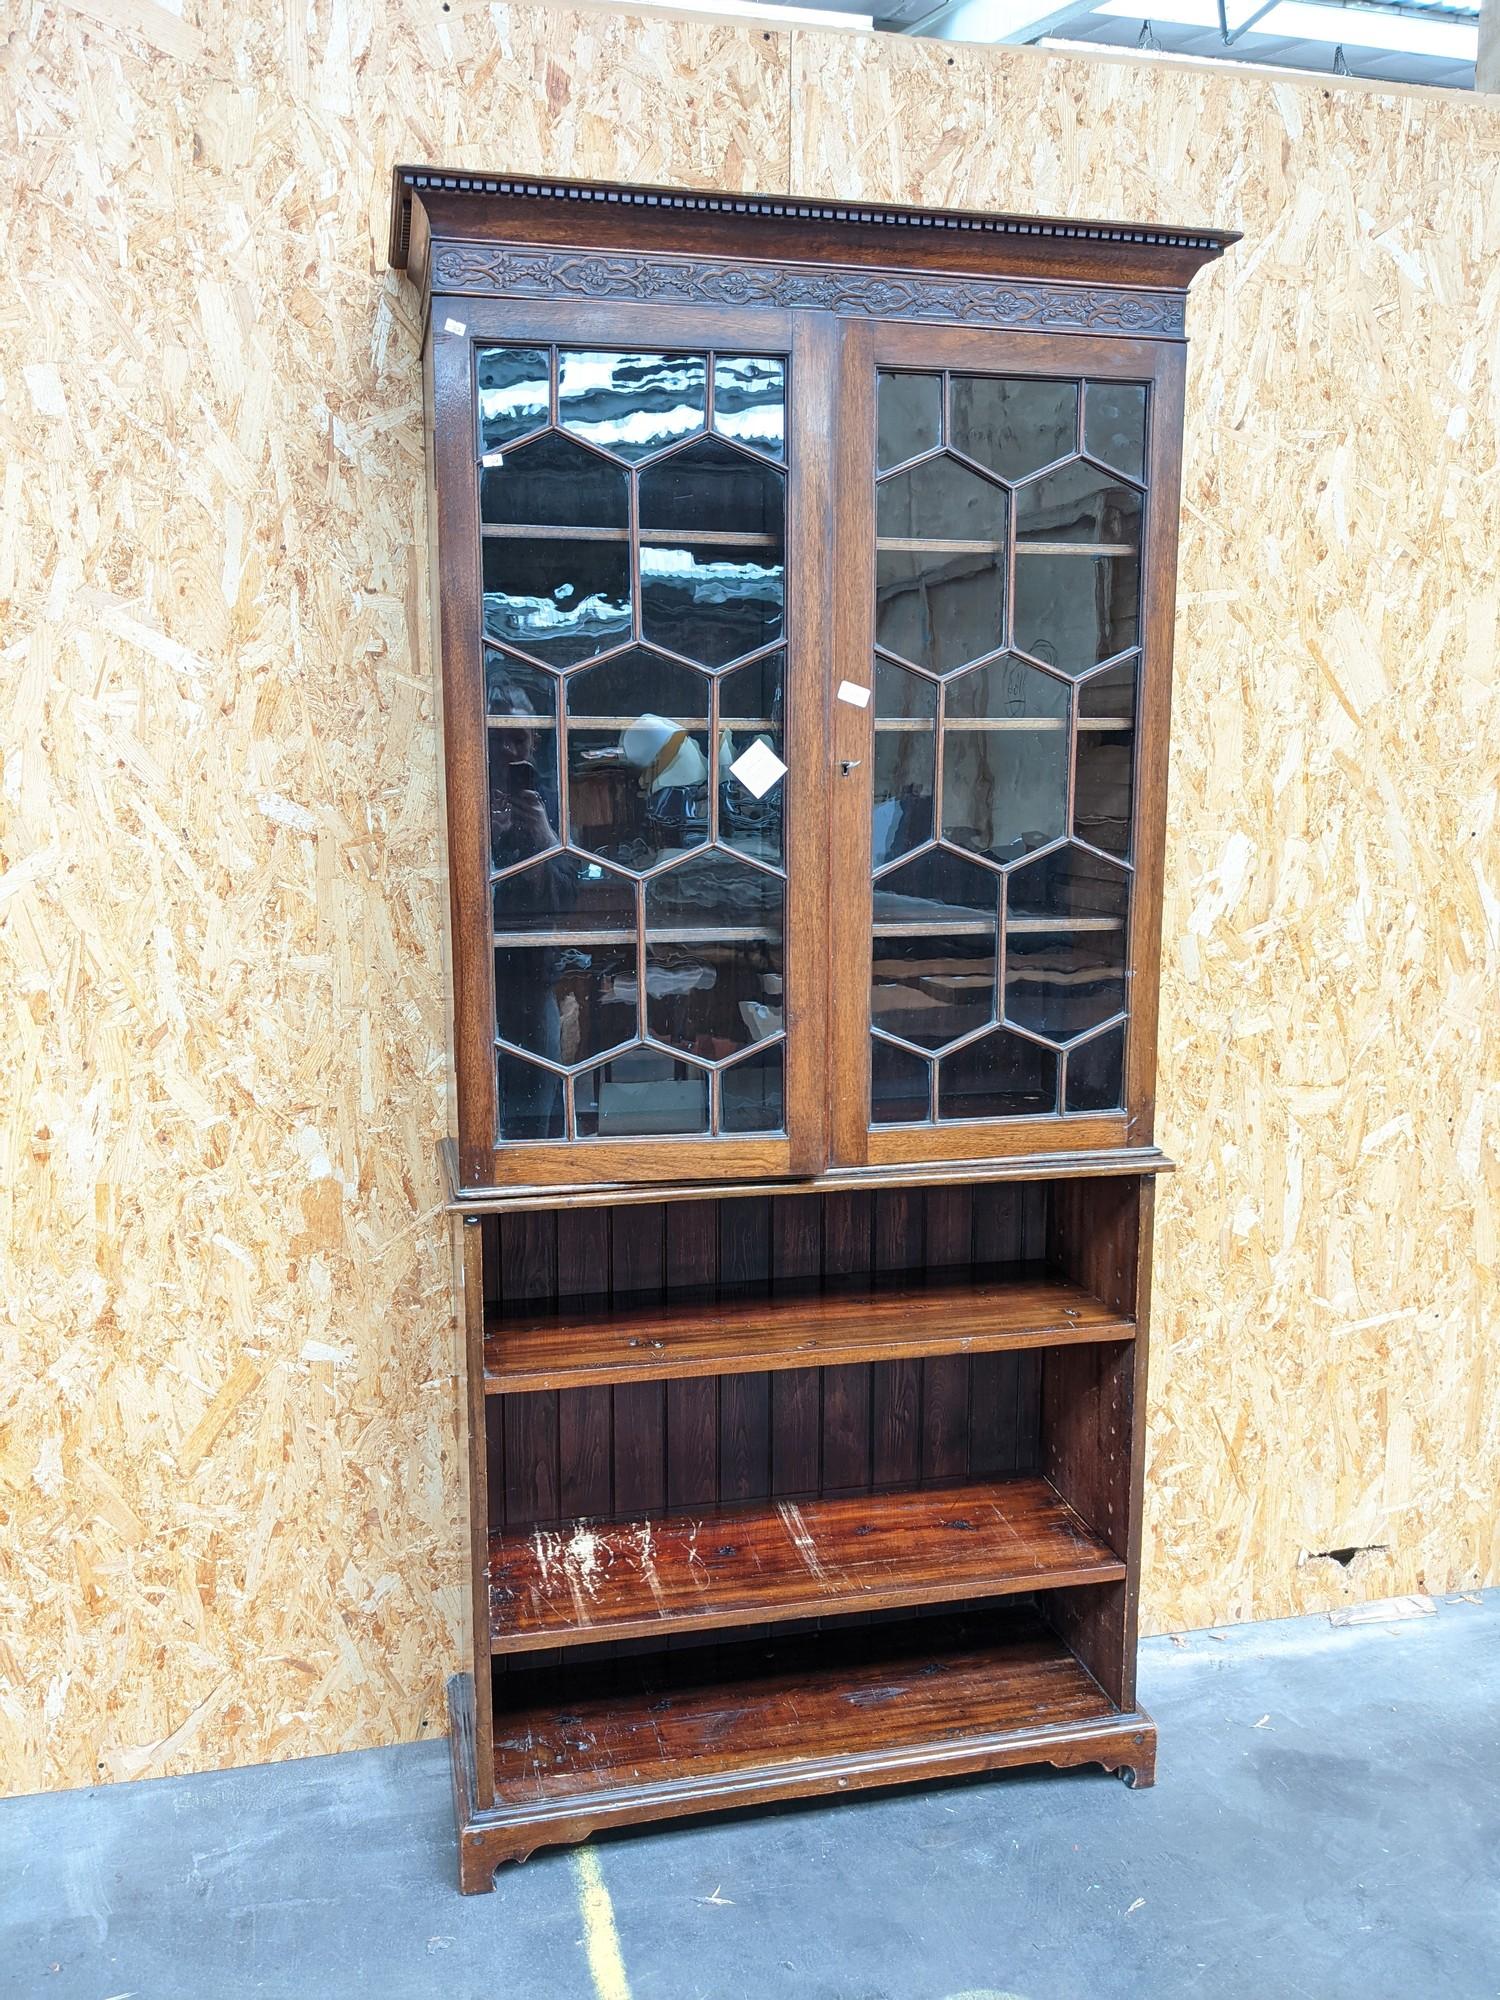 A display case/bookshelf [height, 2.07m, width, 96cm, depth, 34cm]